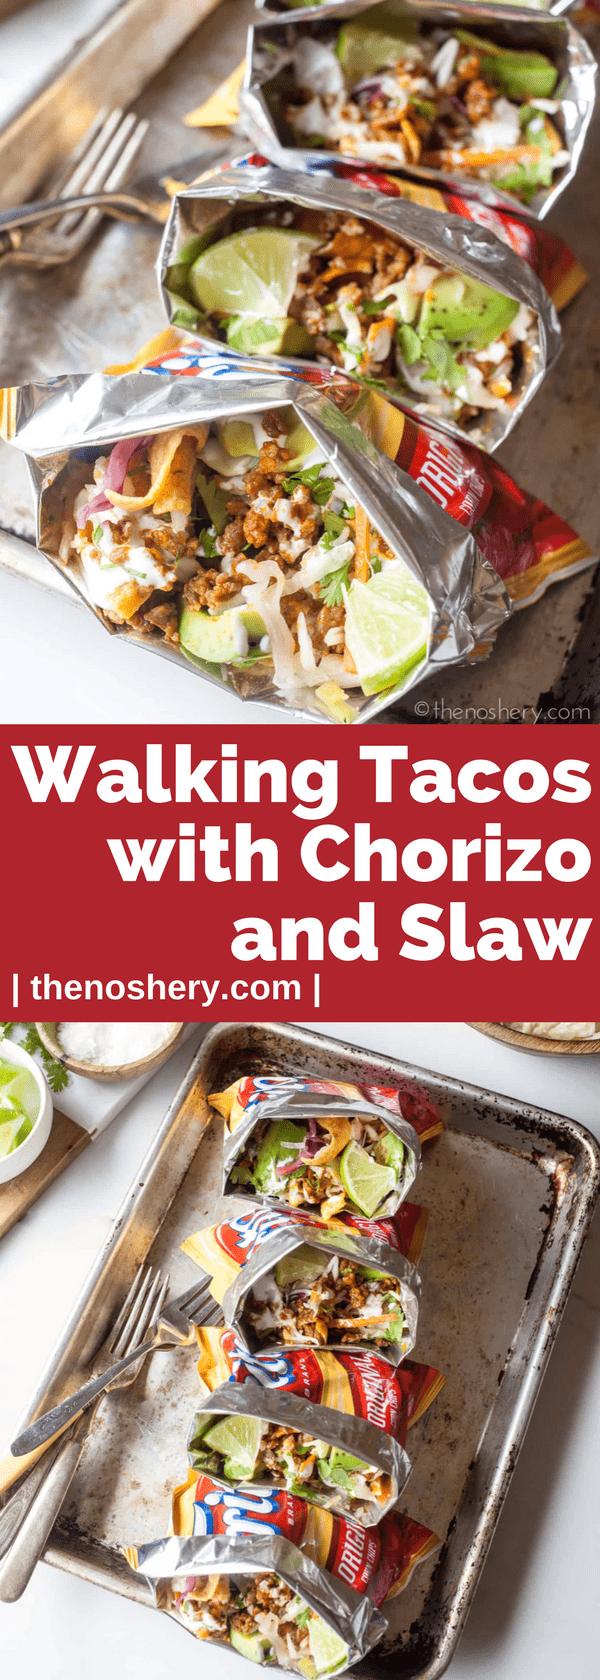 Chorizo Walking Tacos